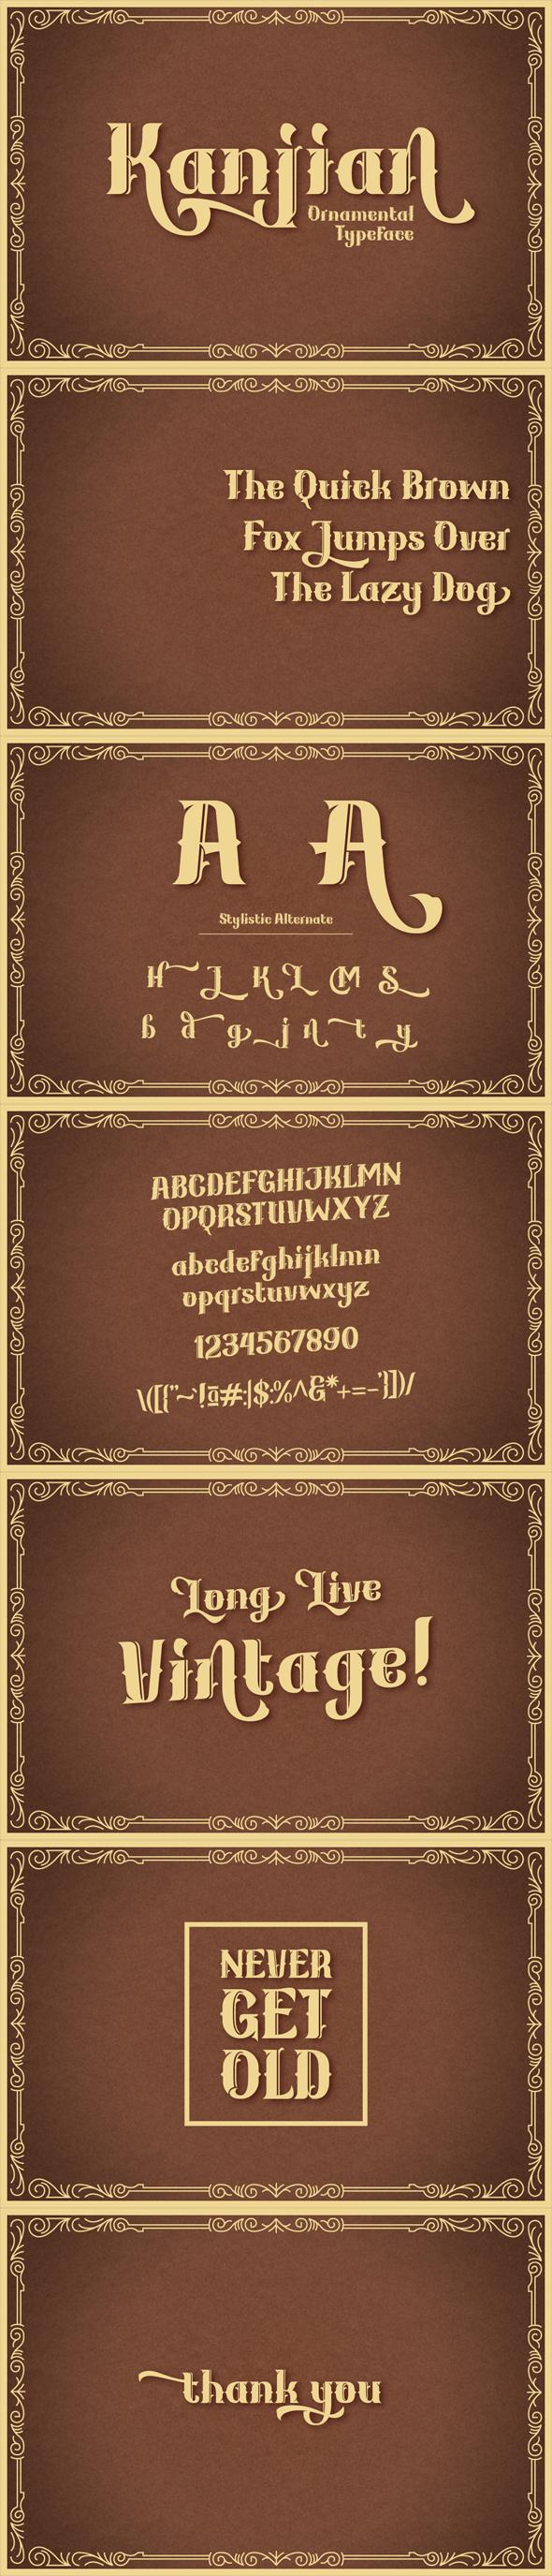 Kanjian Typeface - Foreign Script